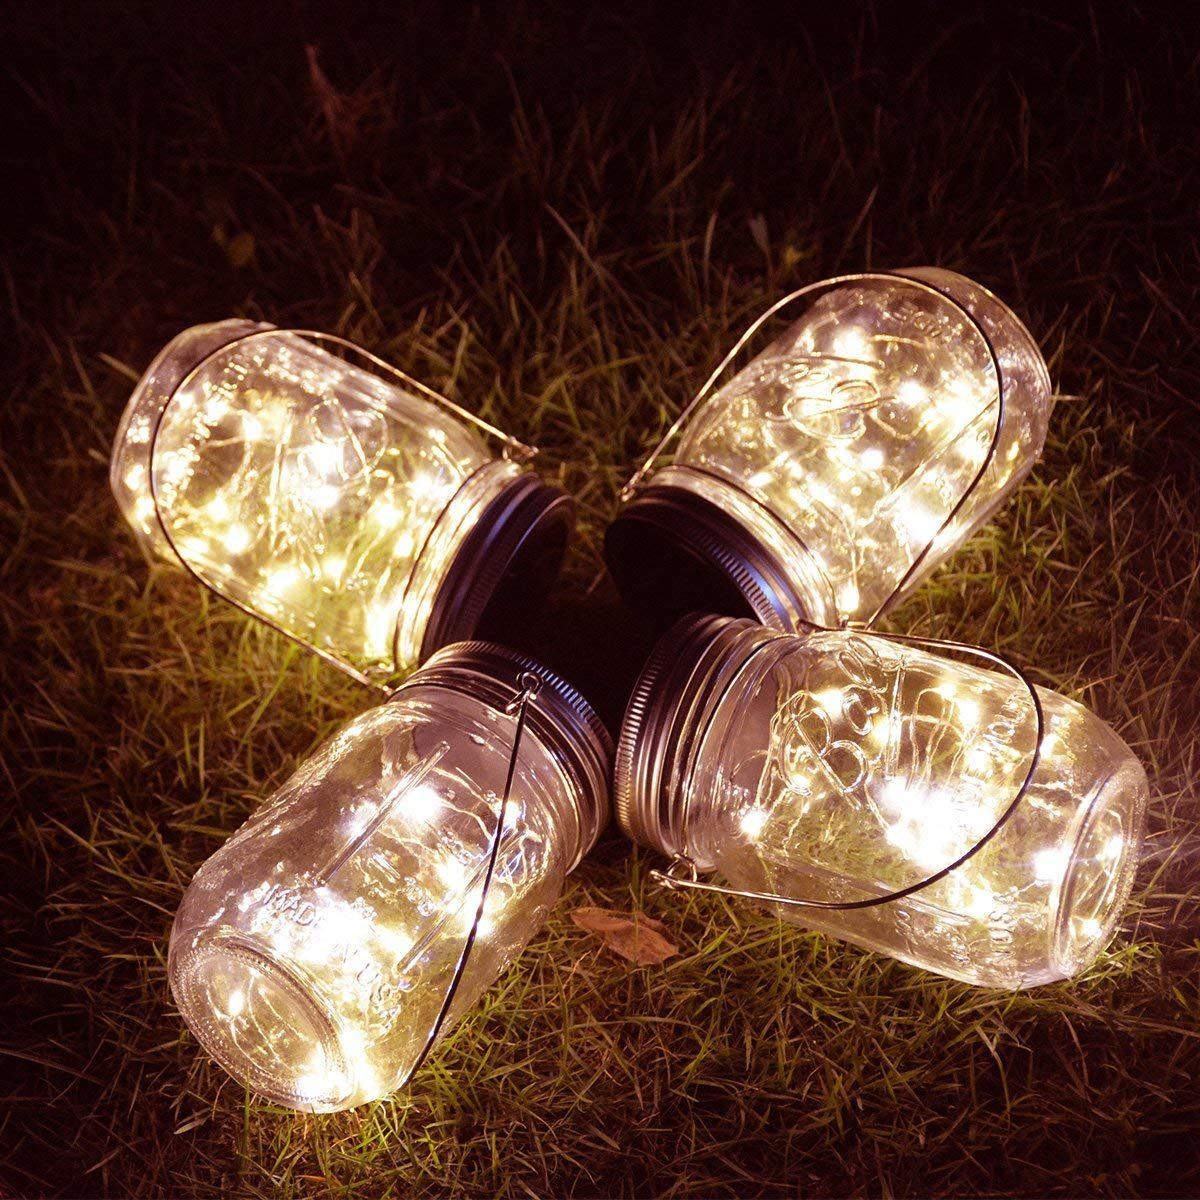 Homeleo 4 Pack Vintage Outdoor Solar Mason Jar Light Set